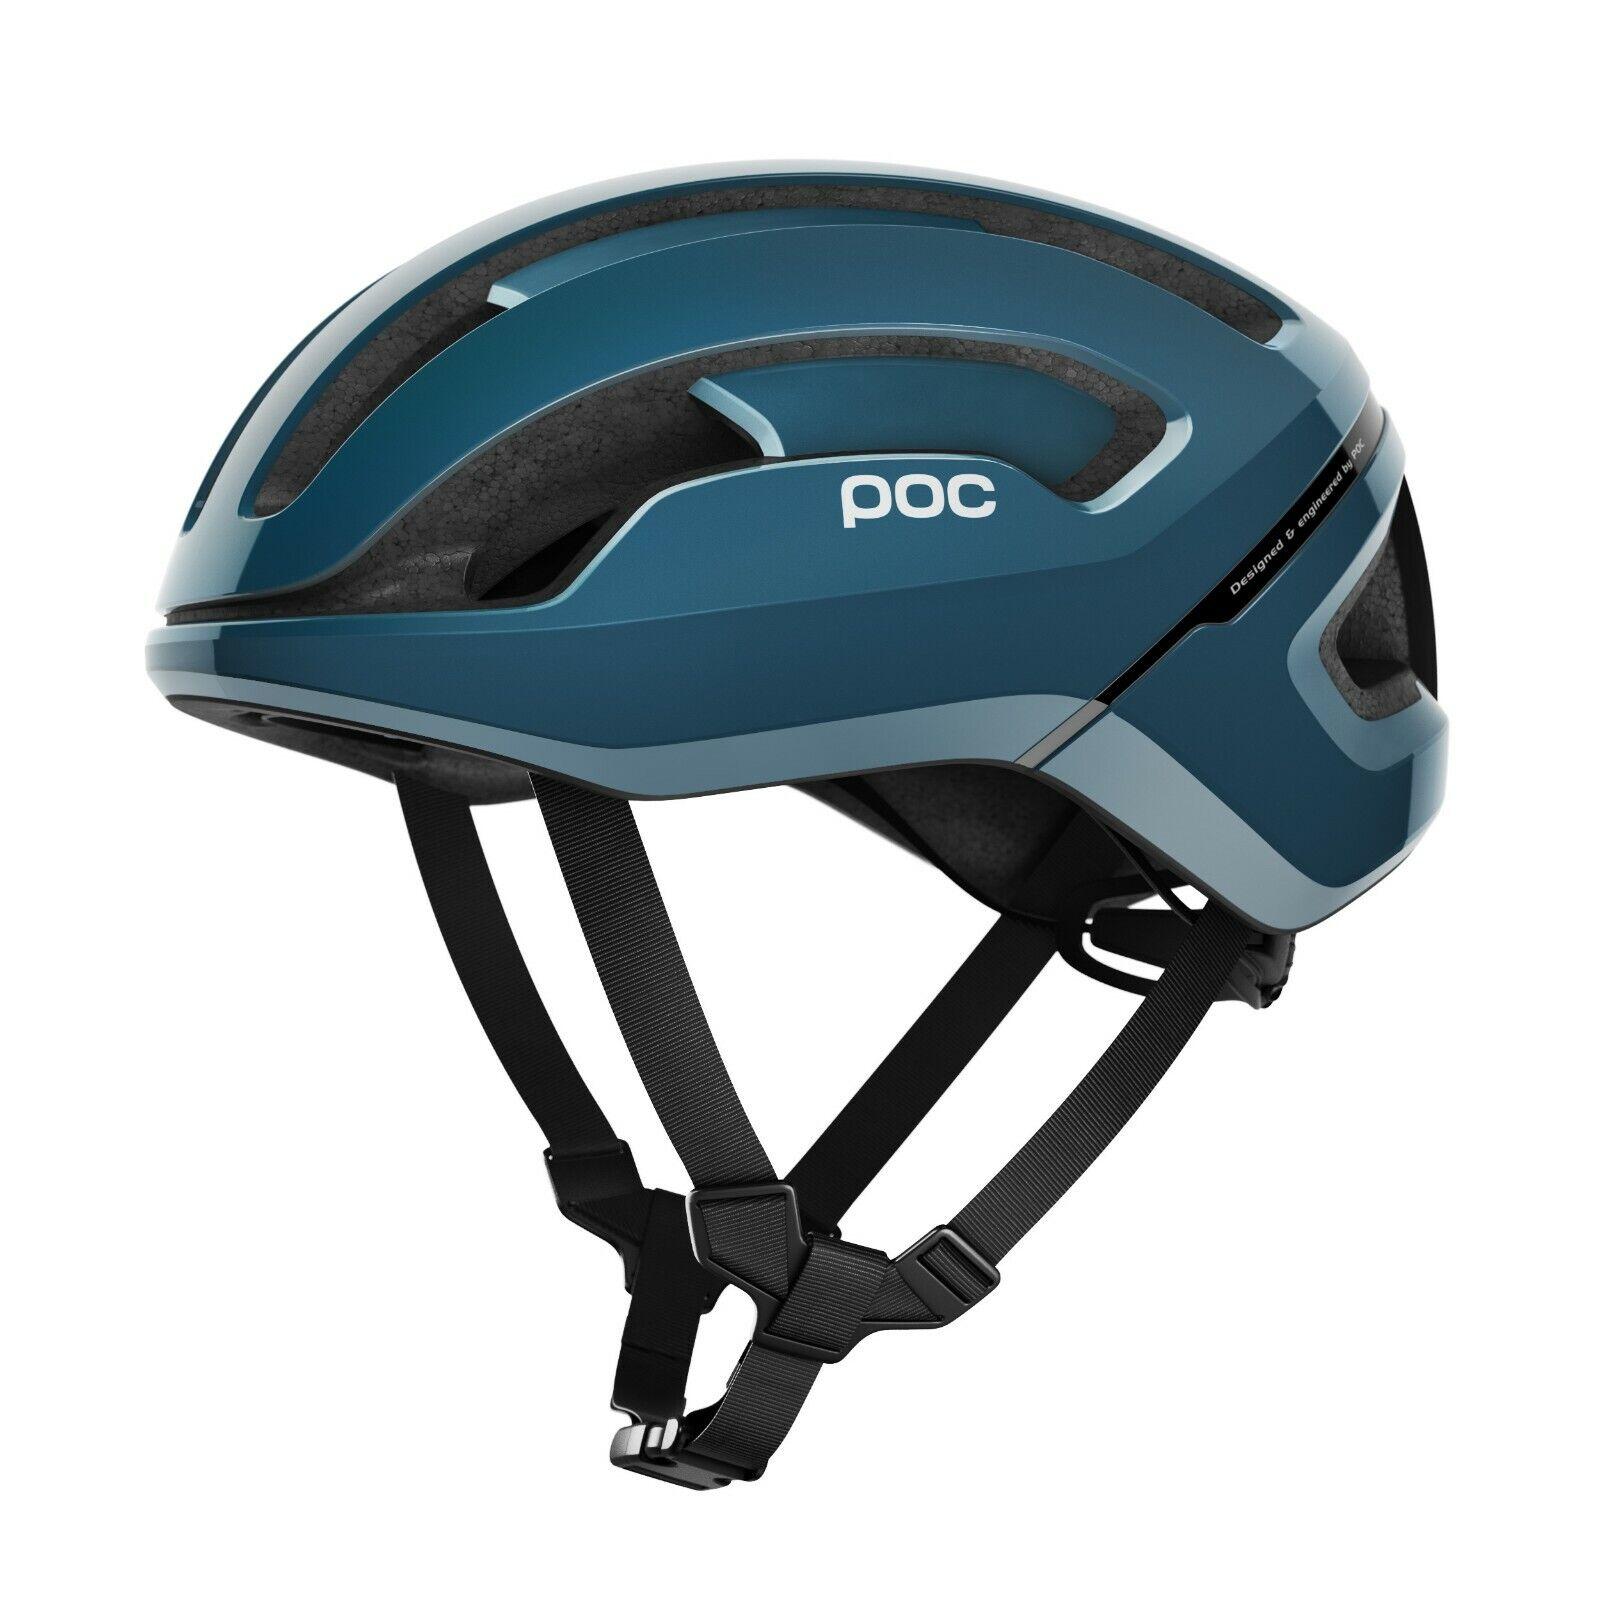 POC Omne Air Spin Cycling Helmet - 2019